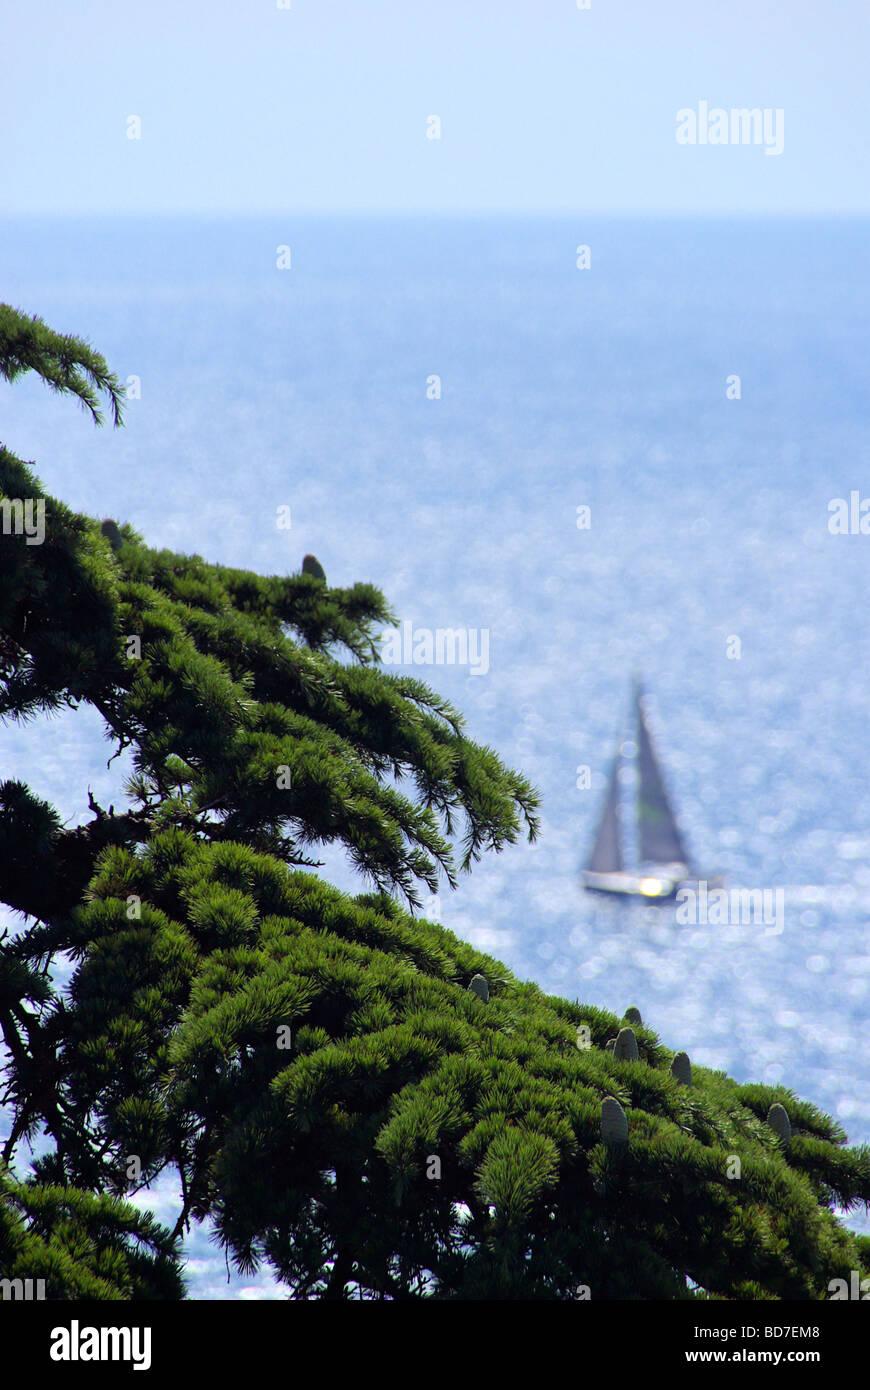 Segelboot mit Zeder cedar with sailing boat 02 - Stock Image